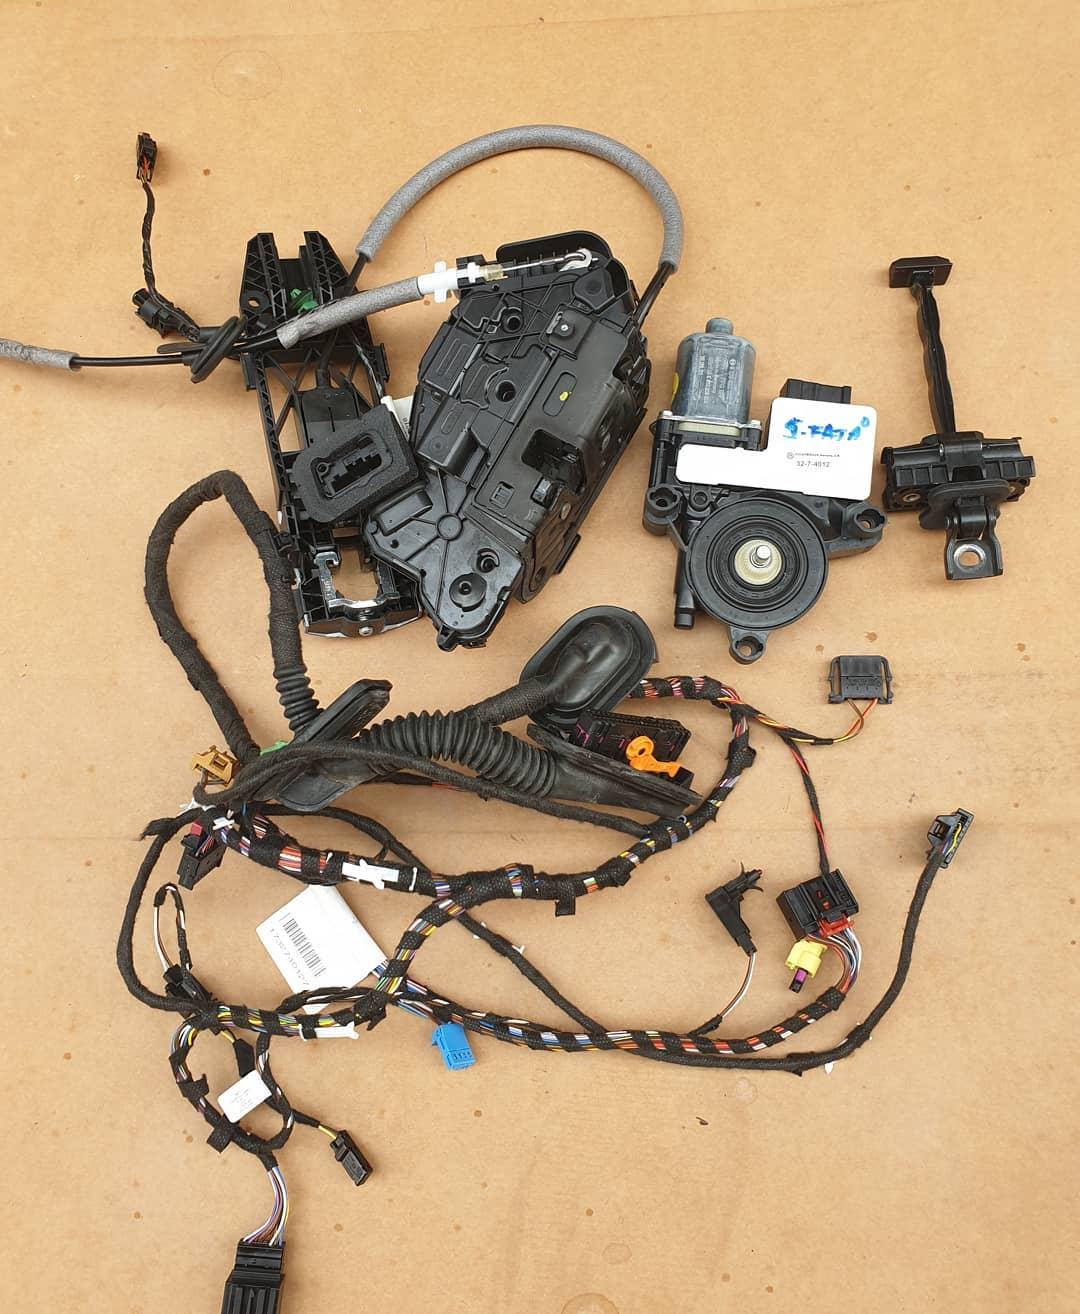 Polo Vl Motoras geam, balama, broasca, incuietoare, senzor impact, instalatie si macara geam usa stanga fata.